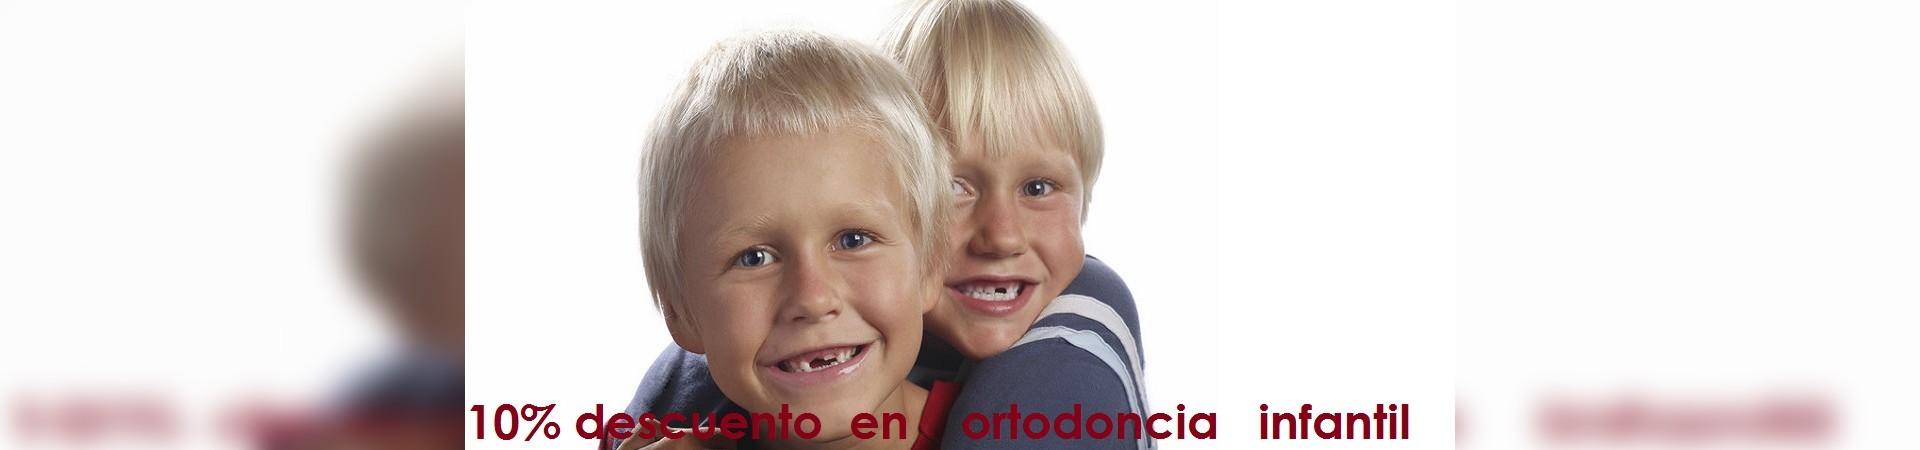 Clínica dental san Sebastián de los reyes, clínica dental sanse